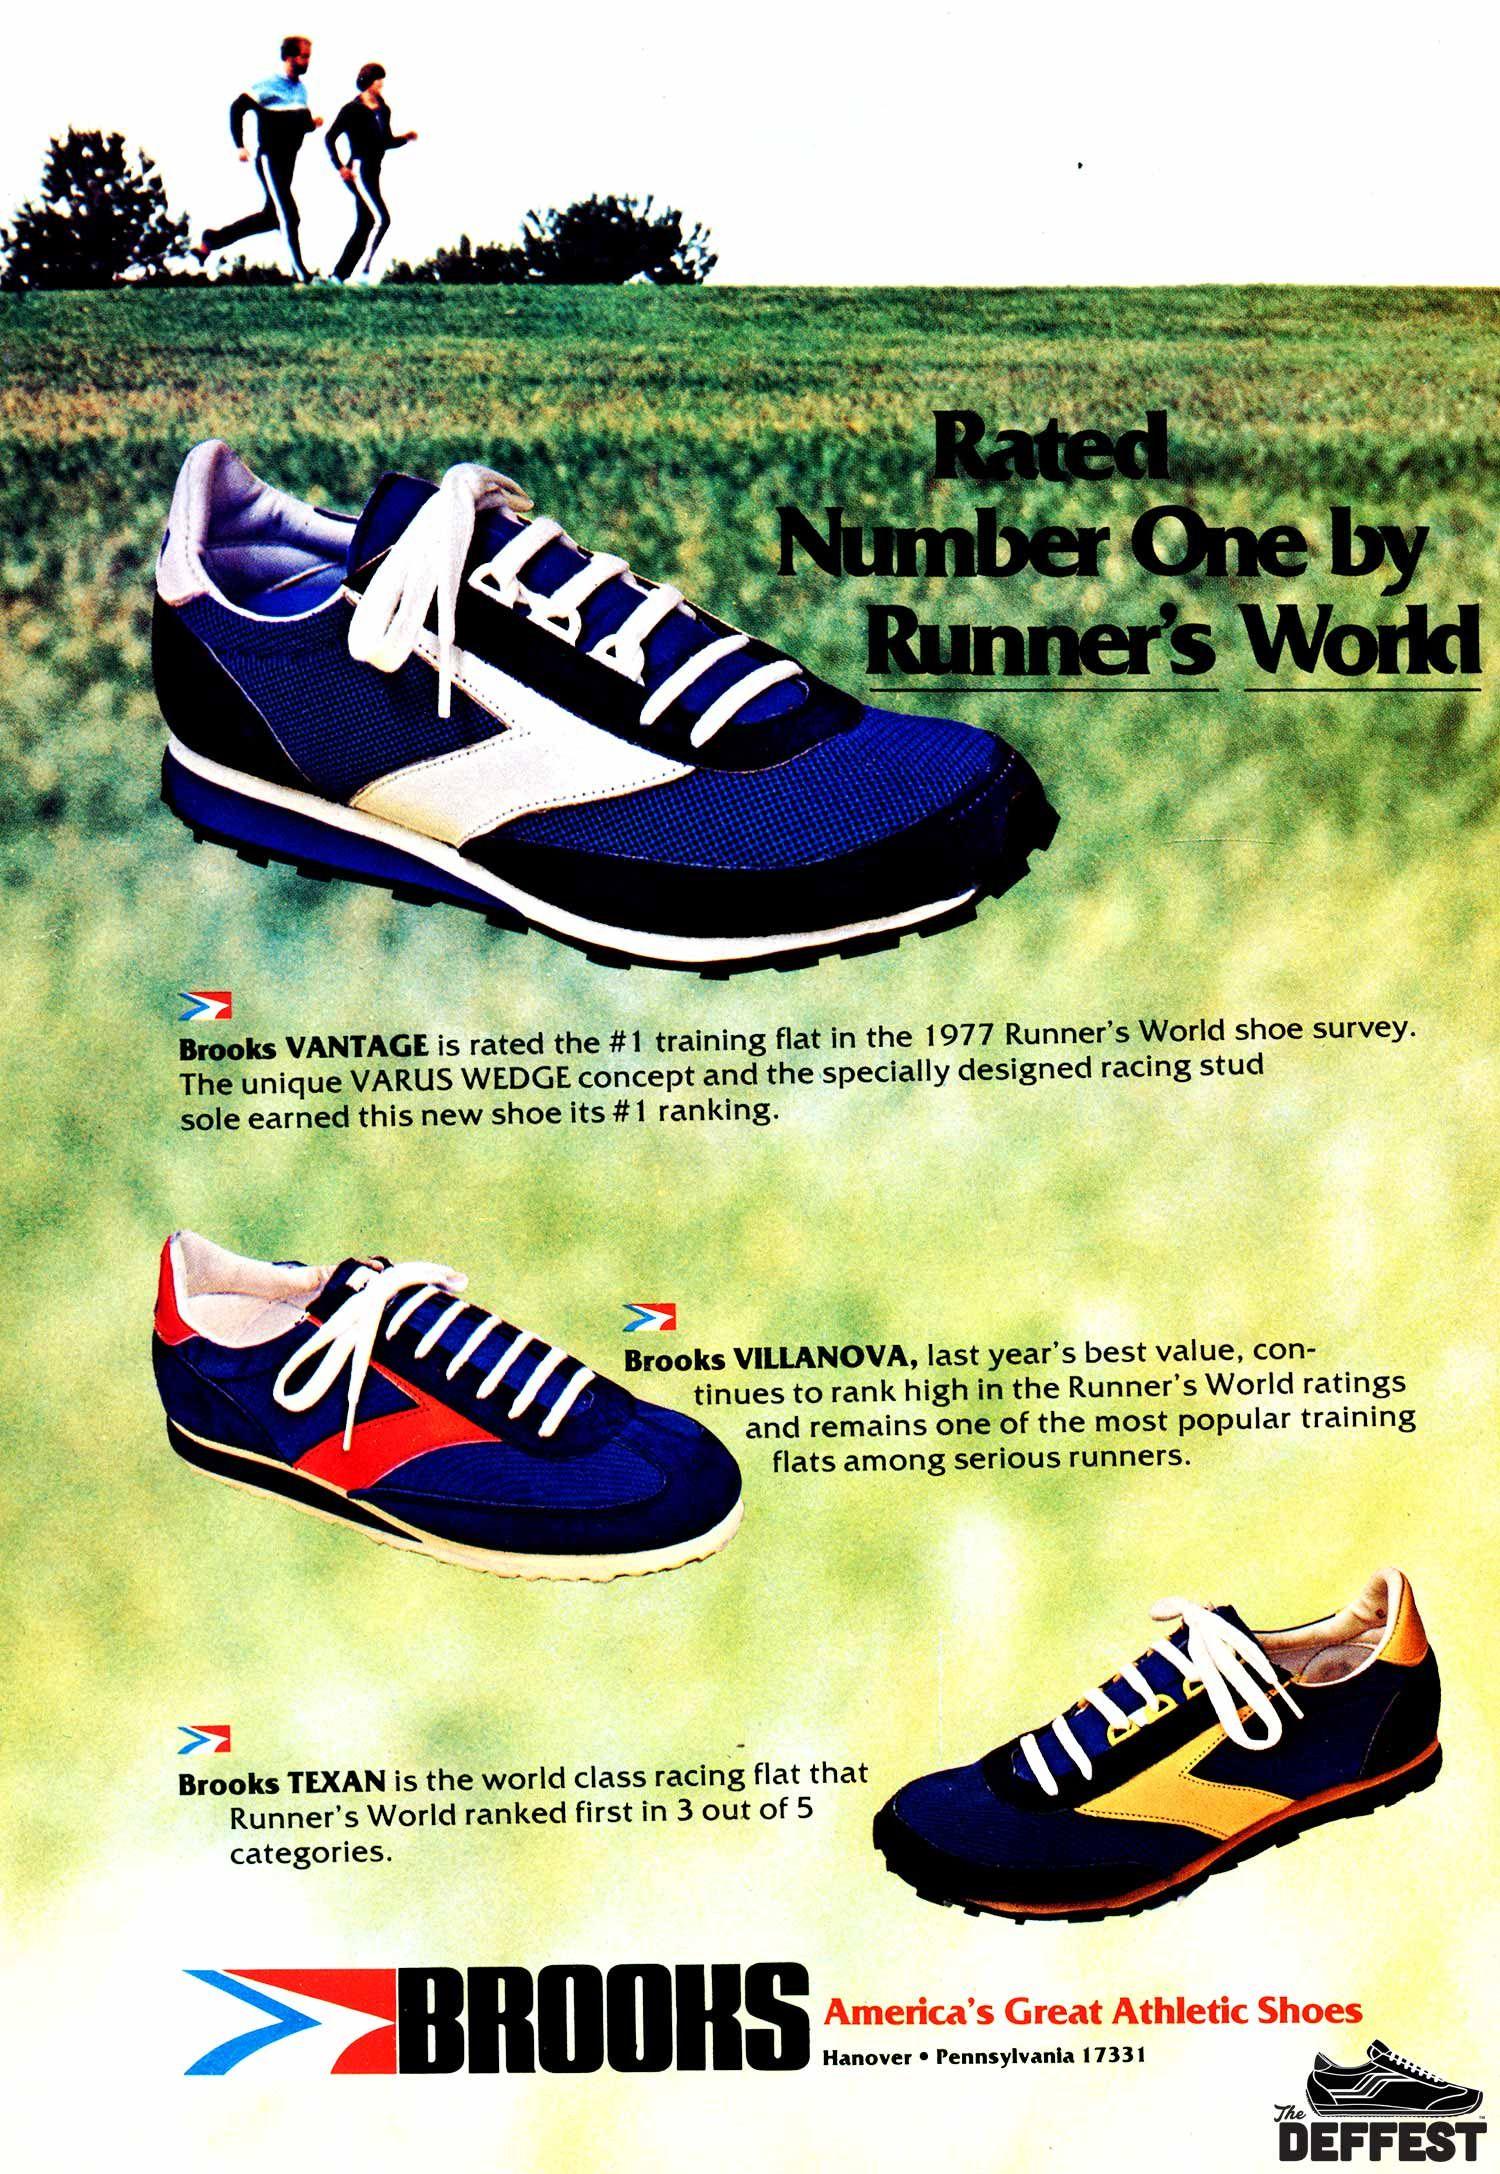 Texan 1978 vintage sneaker ad